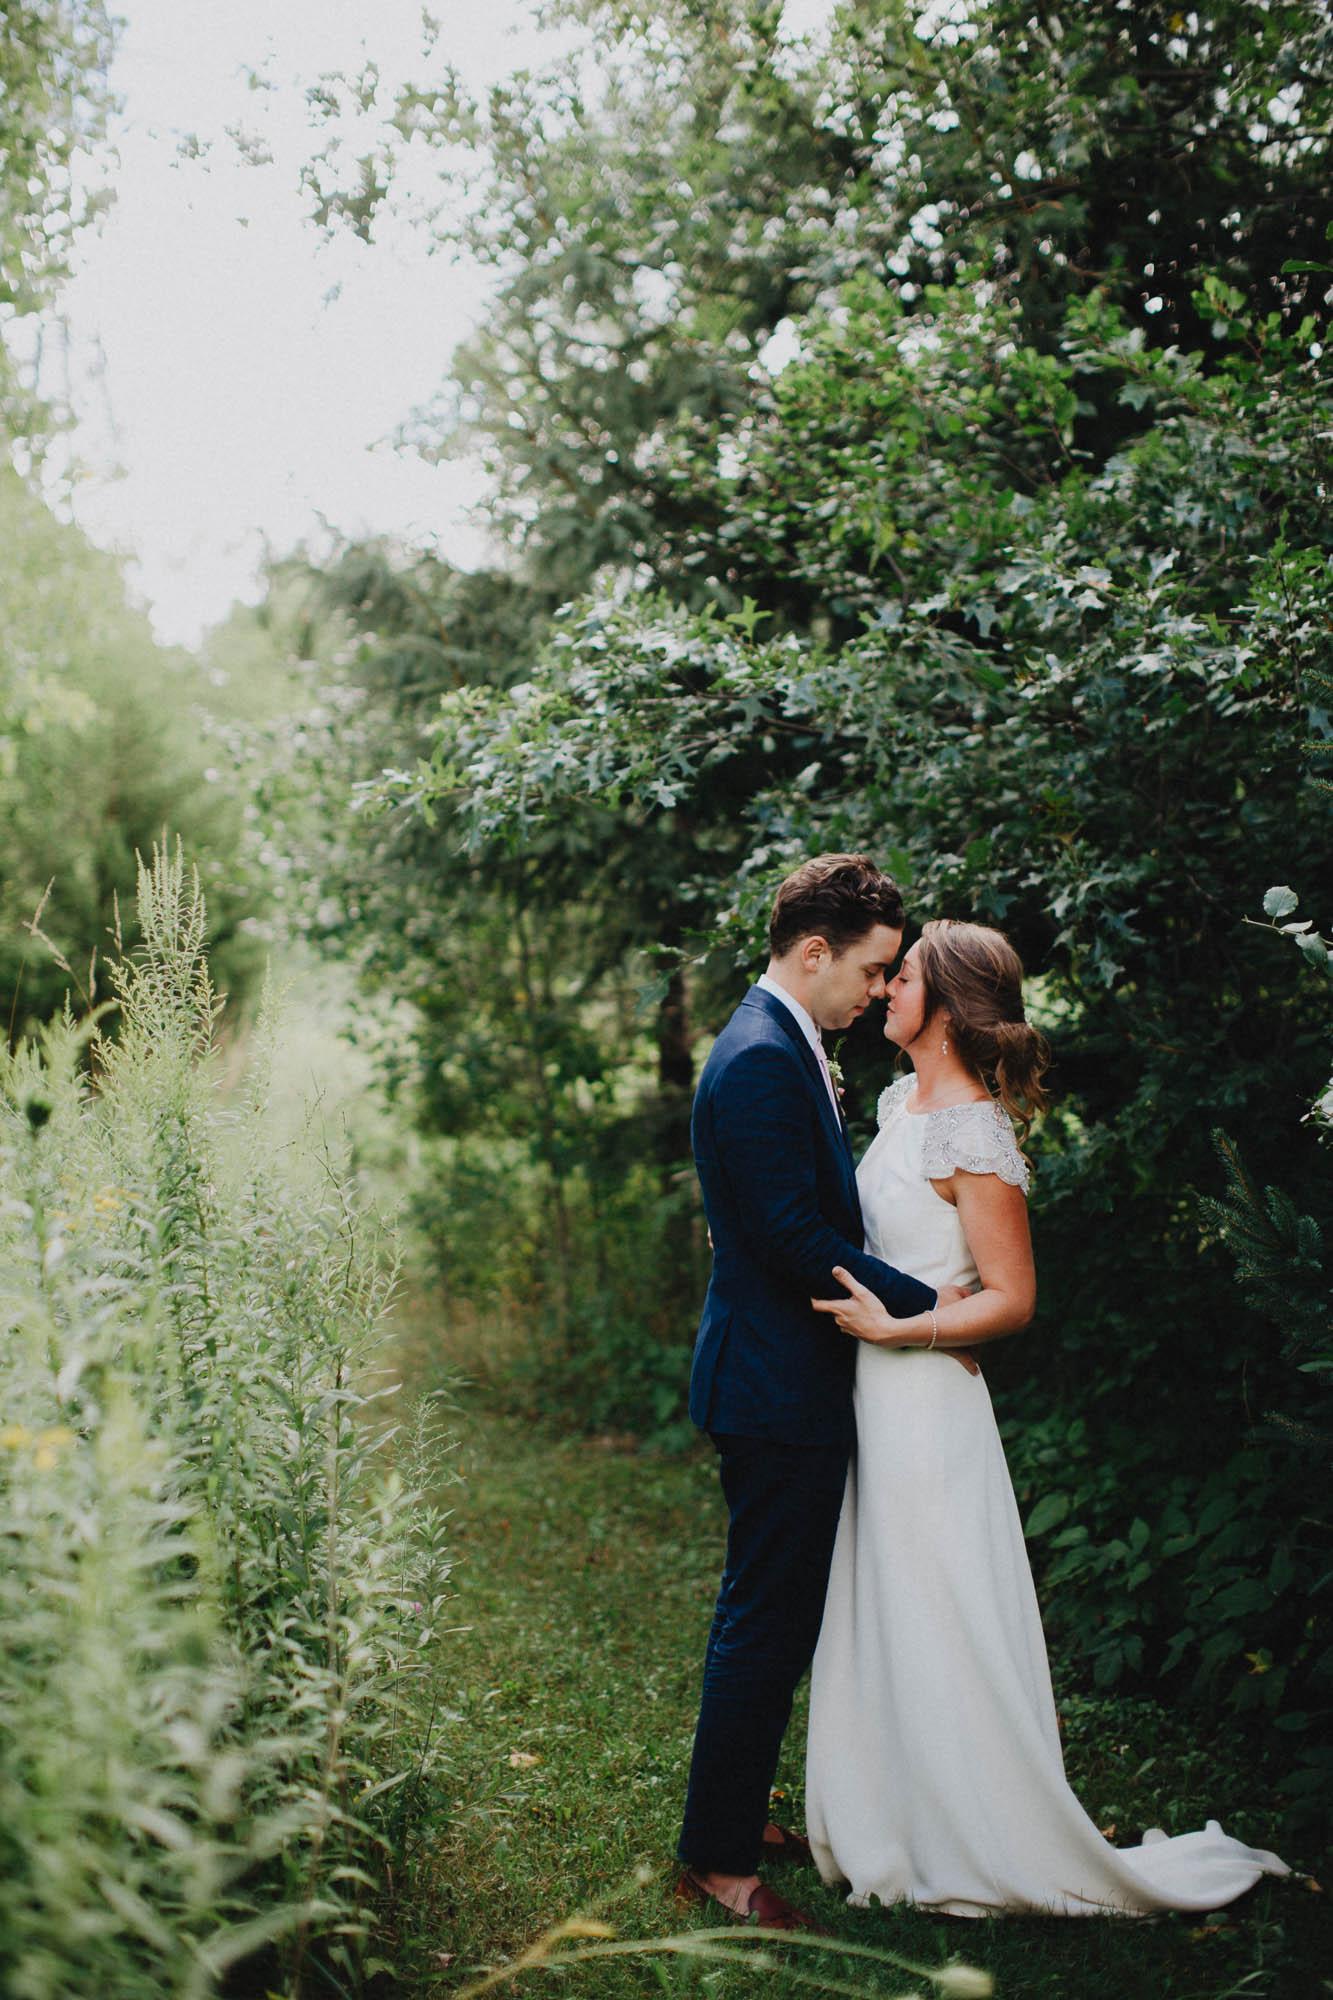 Leah-Graham-Michigan-Outdoor-DIY-Wedding-078@2x.jpg